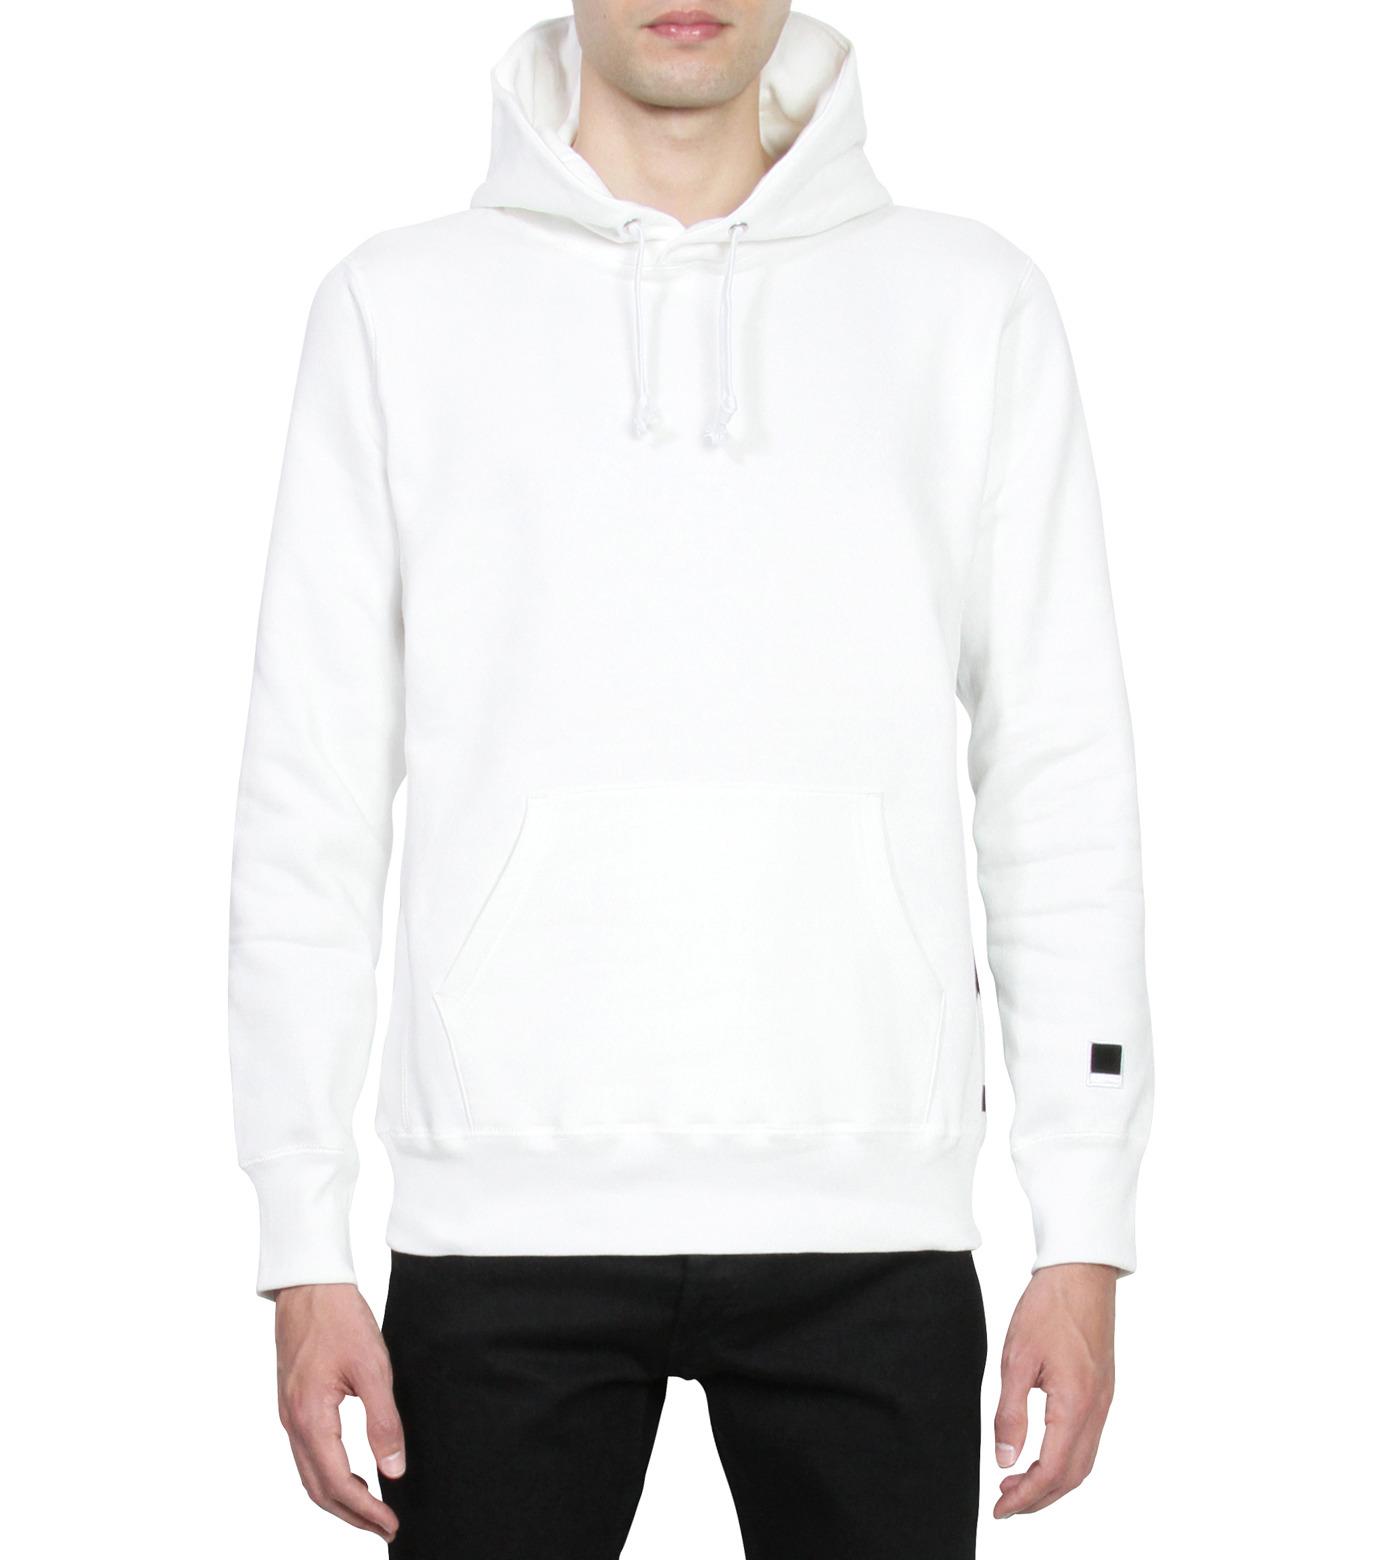 HL HEDDIE LOVU(エイチエル・エディールーヴ)のHL Hooded P/O-WHITE(カットソー/cut and sewn)-16A92008-4 拡大詳細画像1